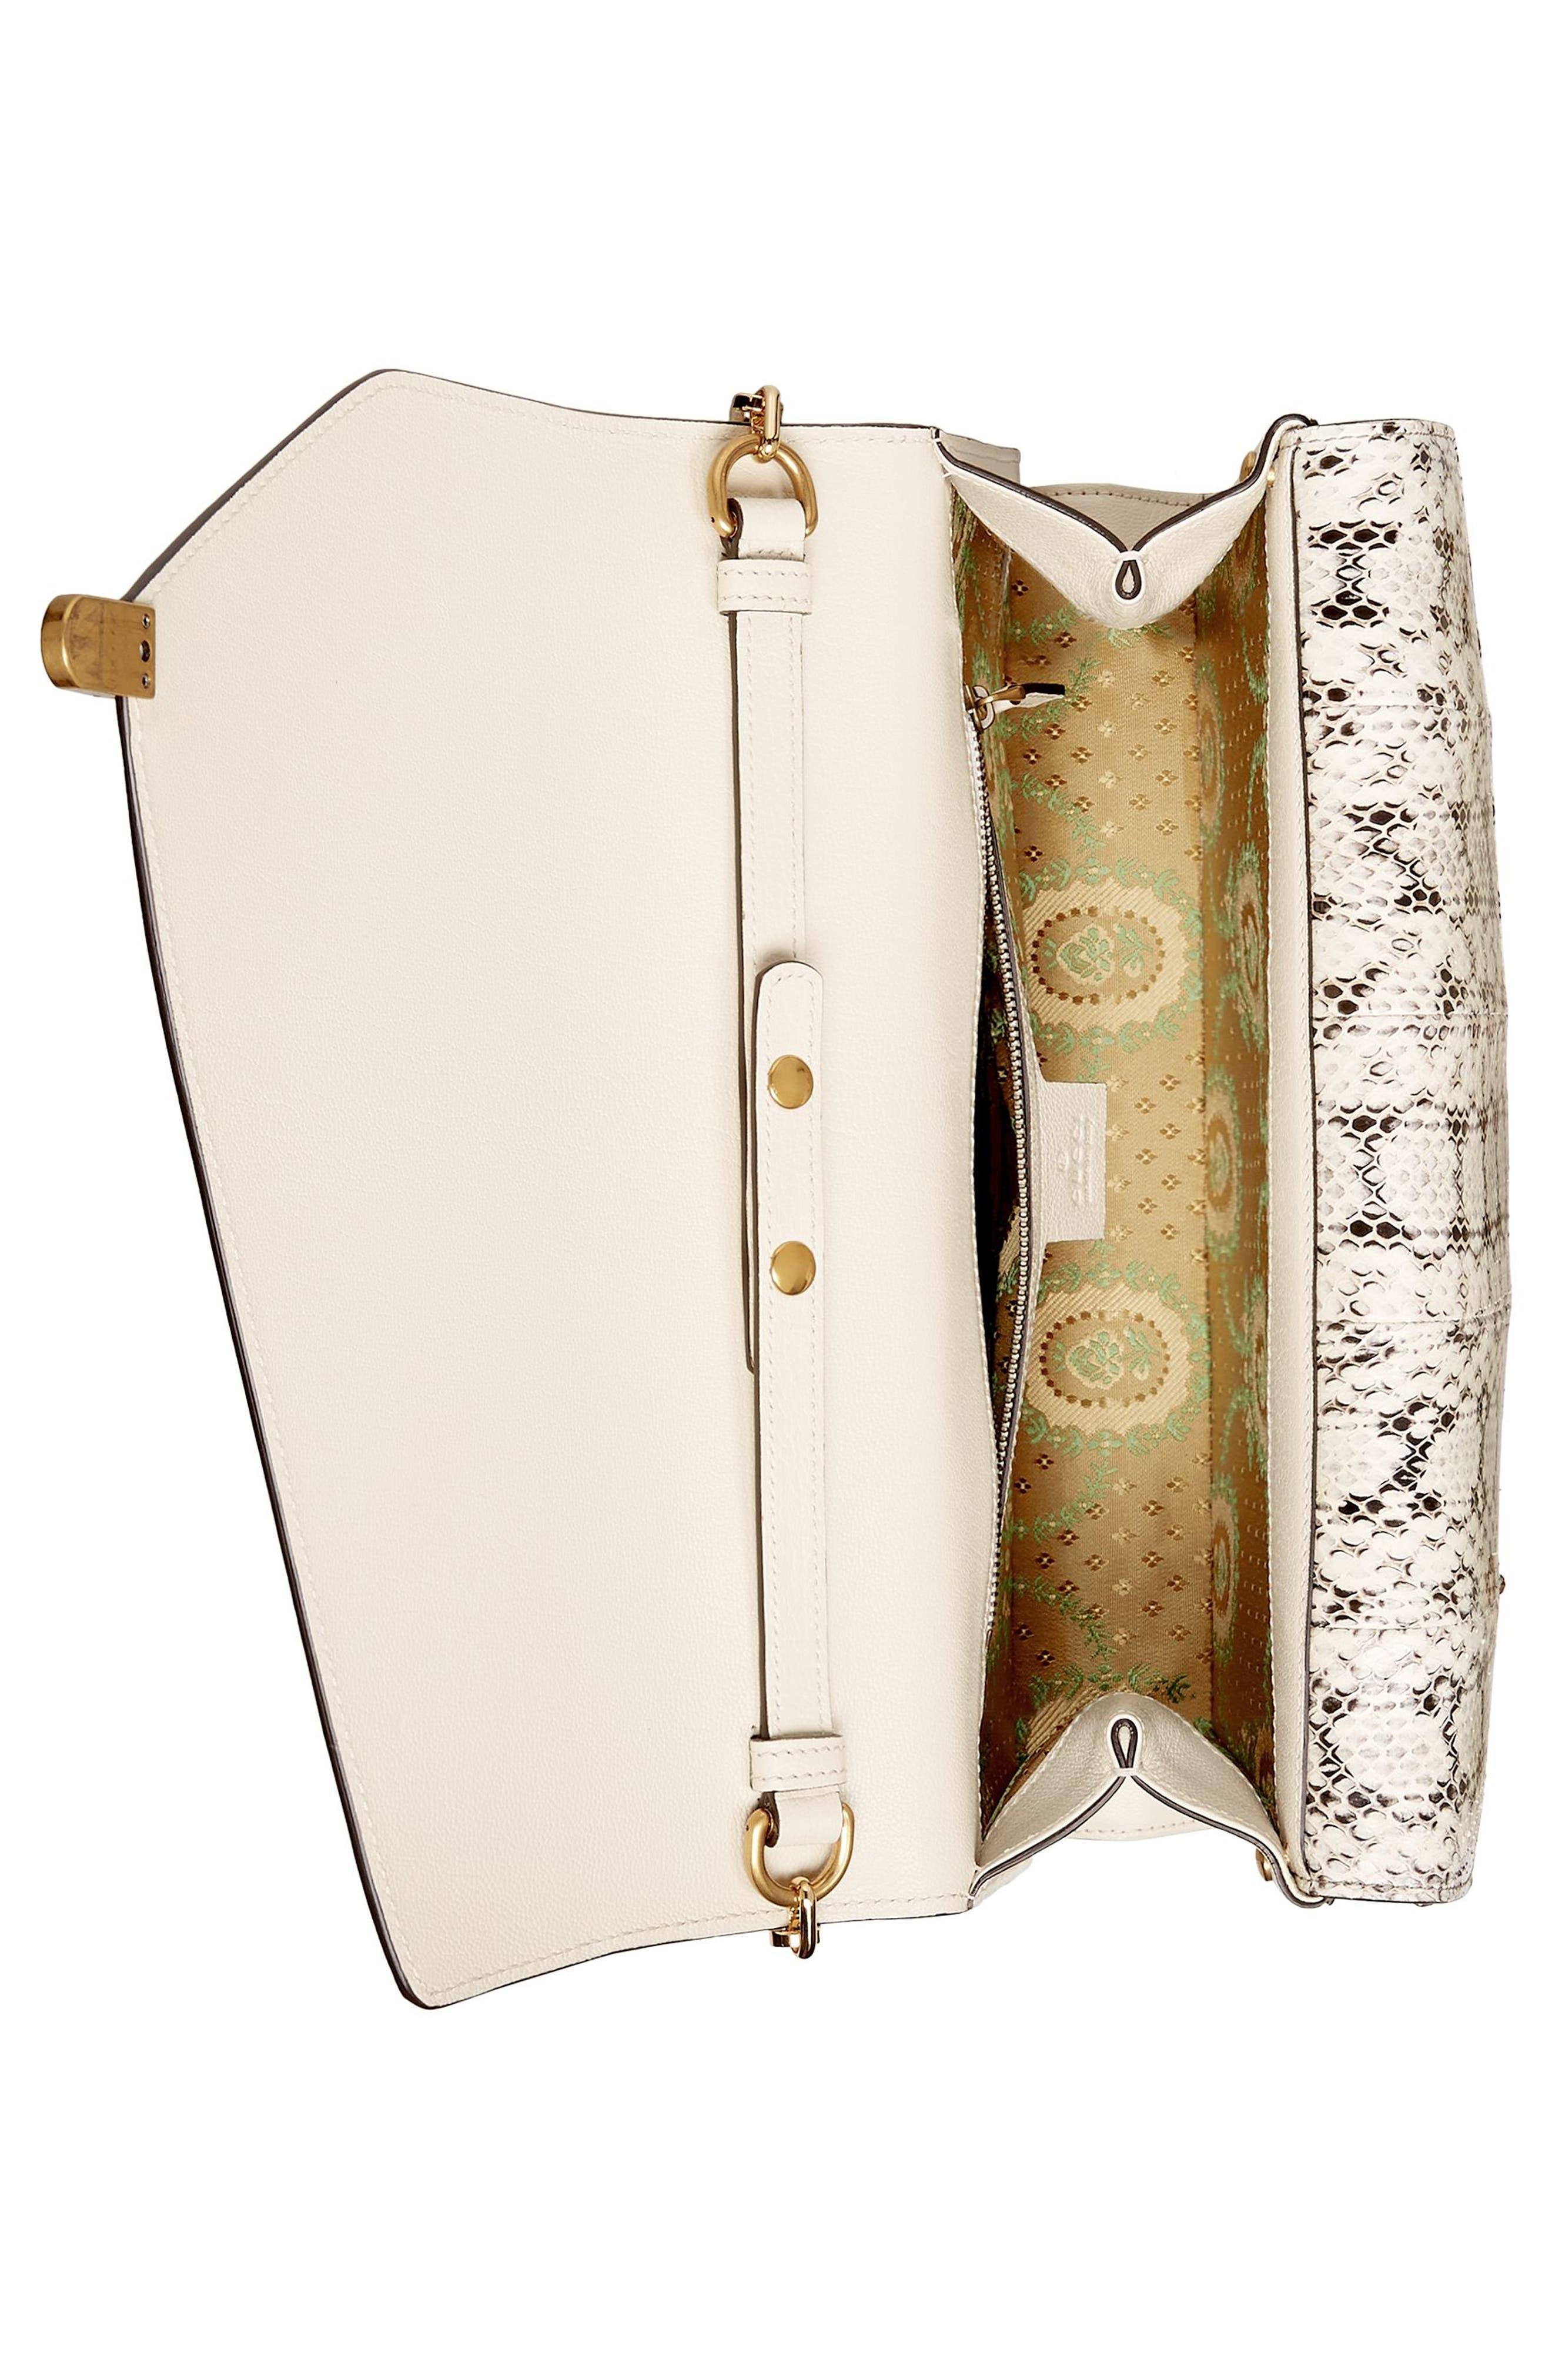 Medium Linea P Butterfly Painted Leather & Genuine Snakeskin Top Handle Satchel,                             Alternate thumbnail 3, color,                             White/ Multi